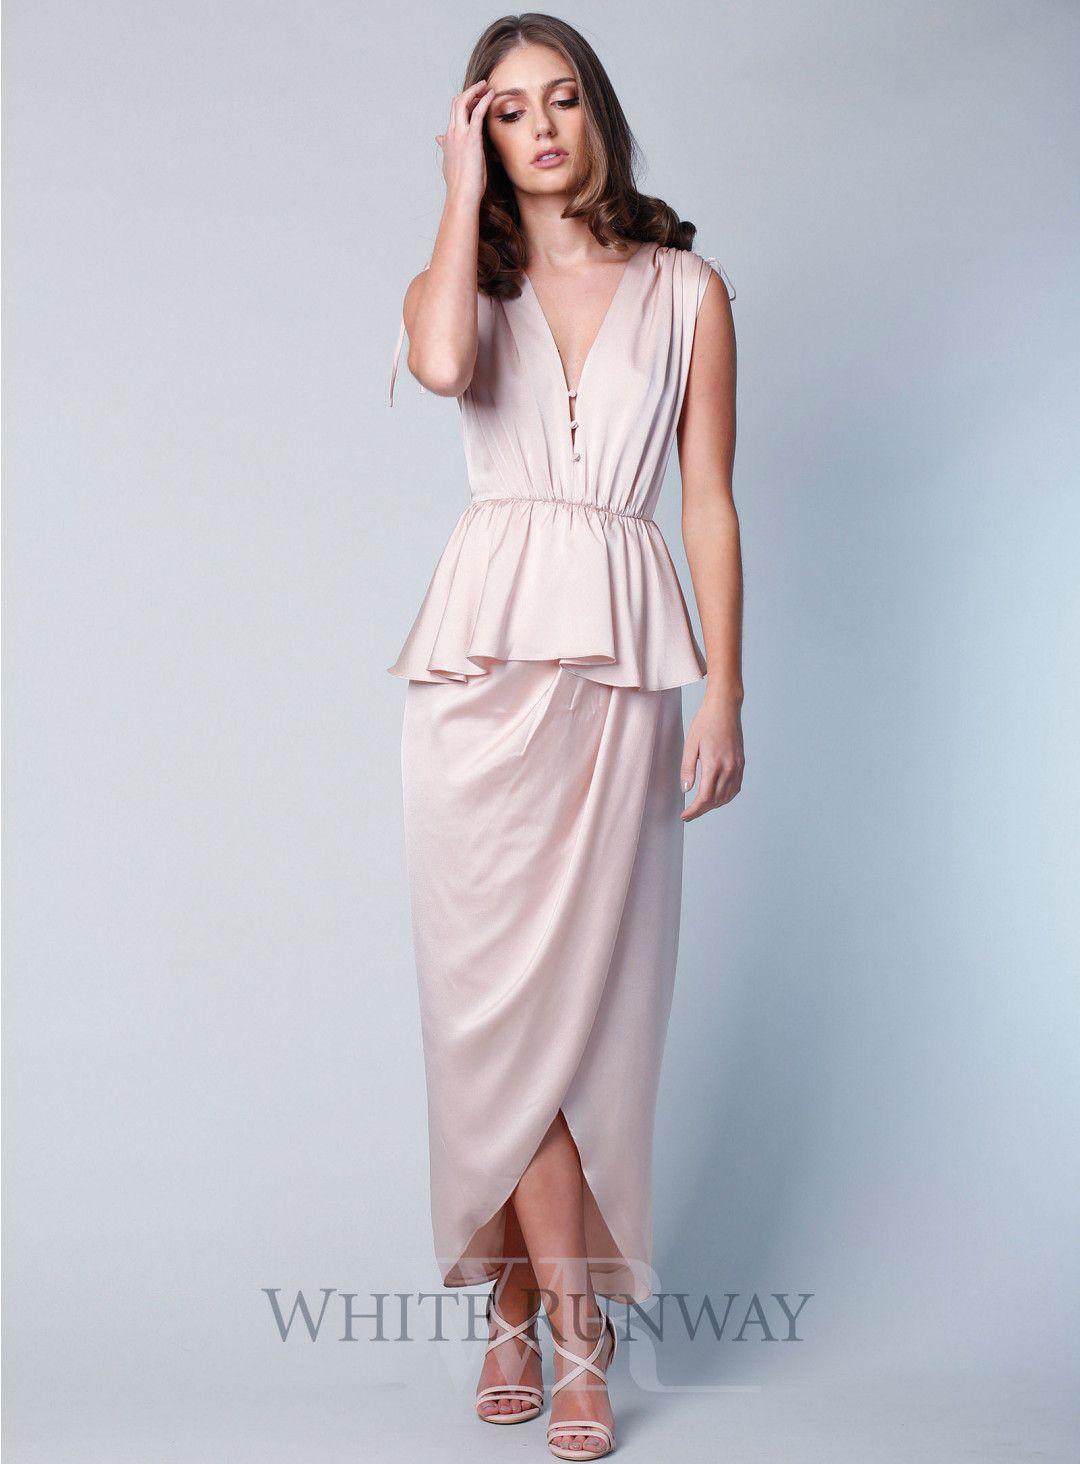 Beach dresses for weddings  Calypso Ruched Peplum Maxi  Champagne Bridesmaids  Pinterest